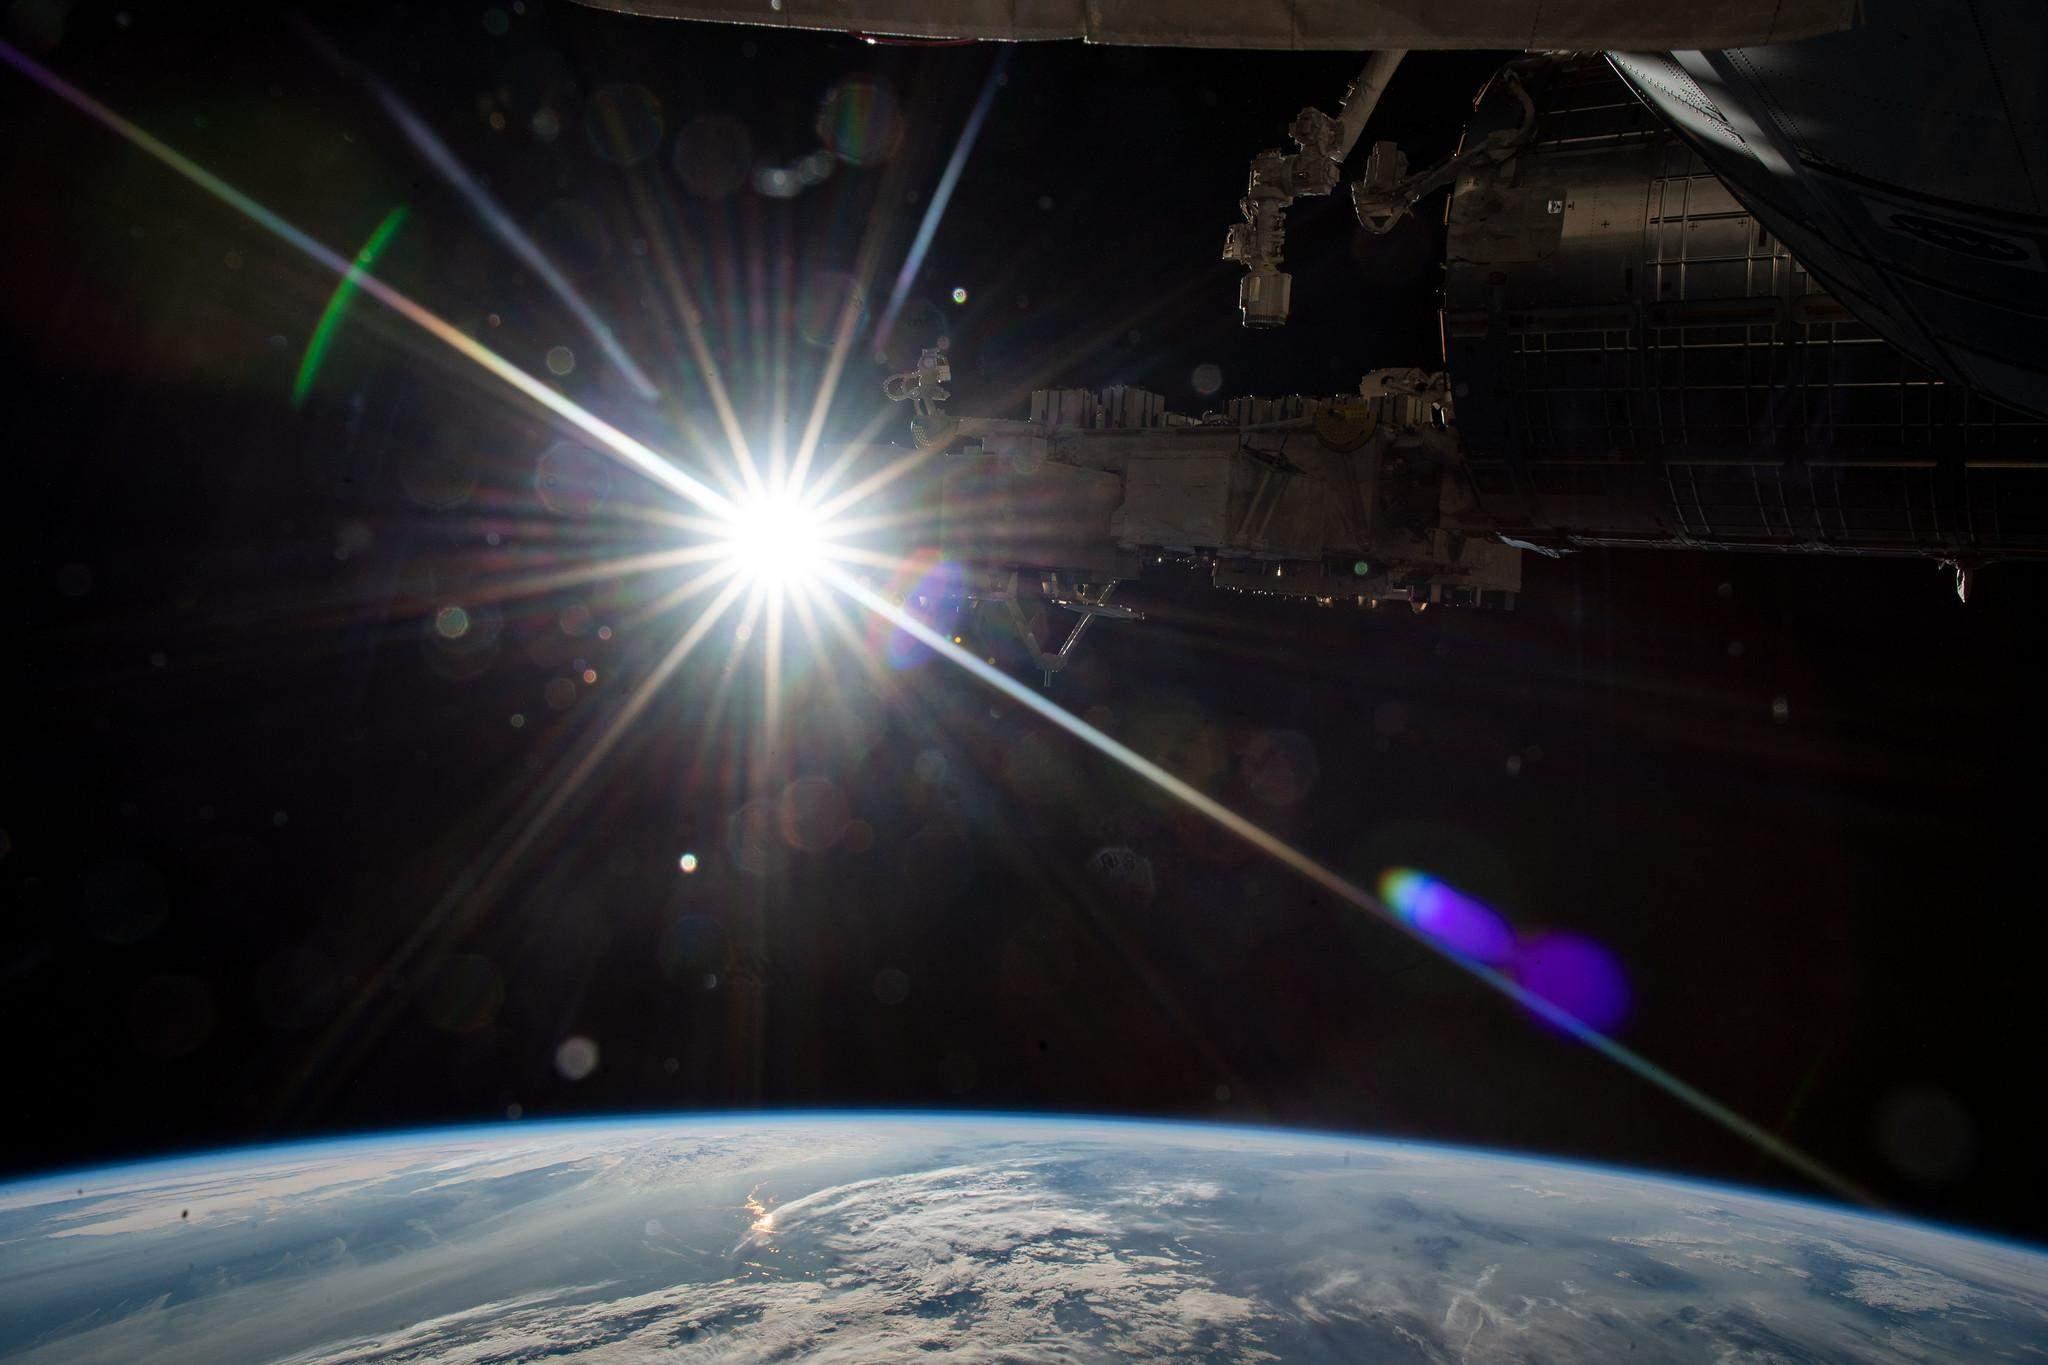 Сонце з МКС